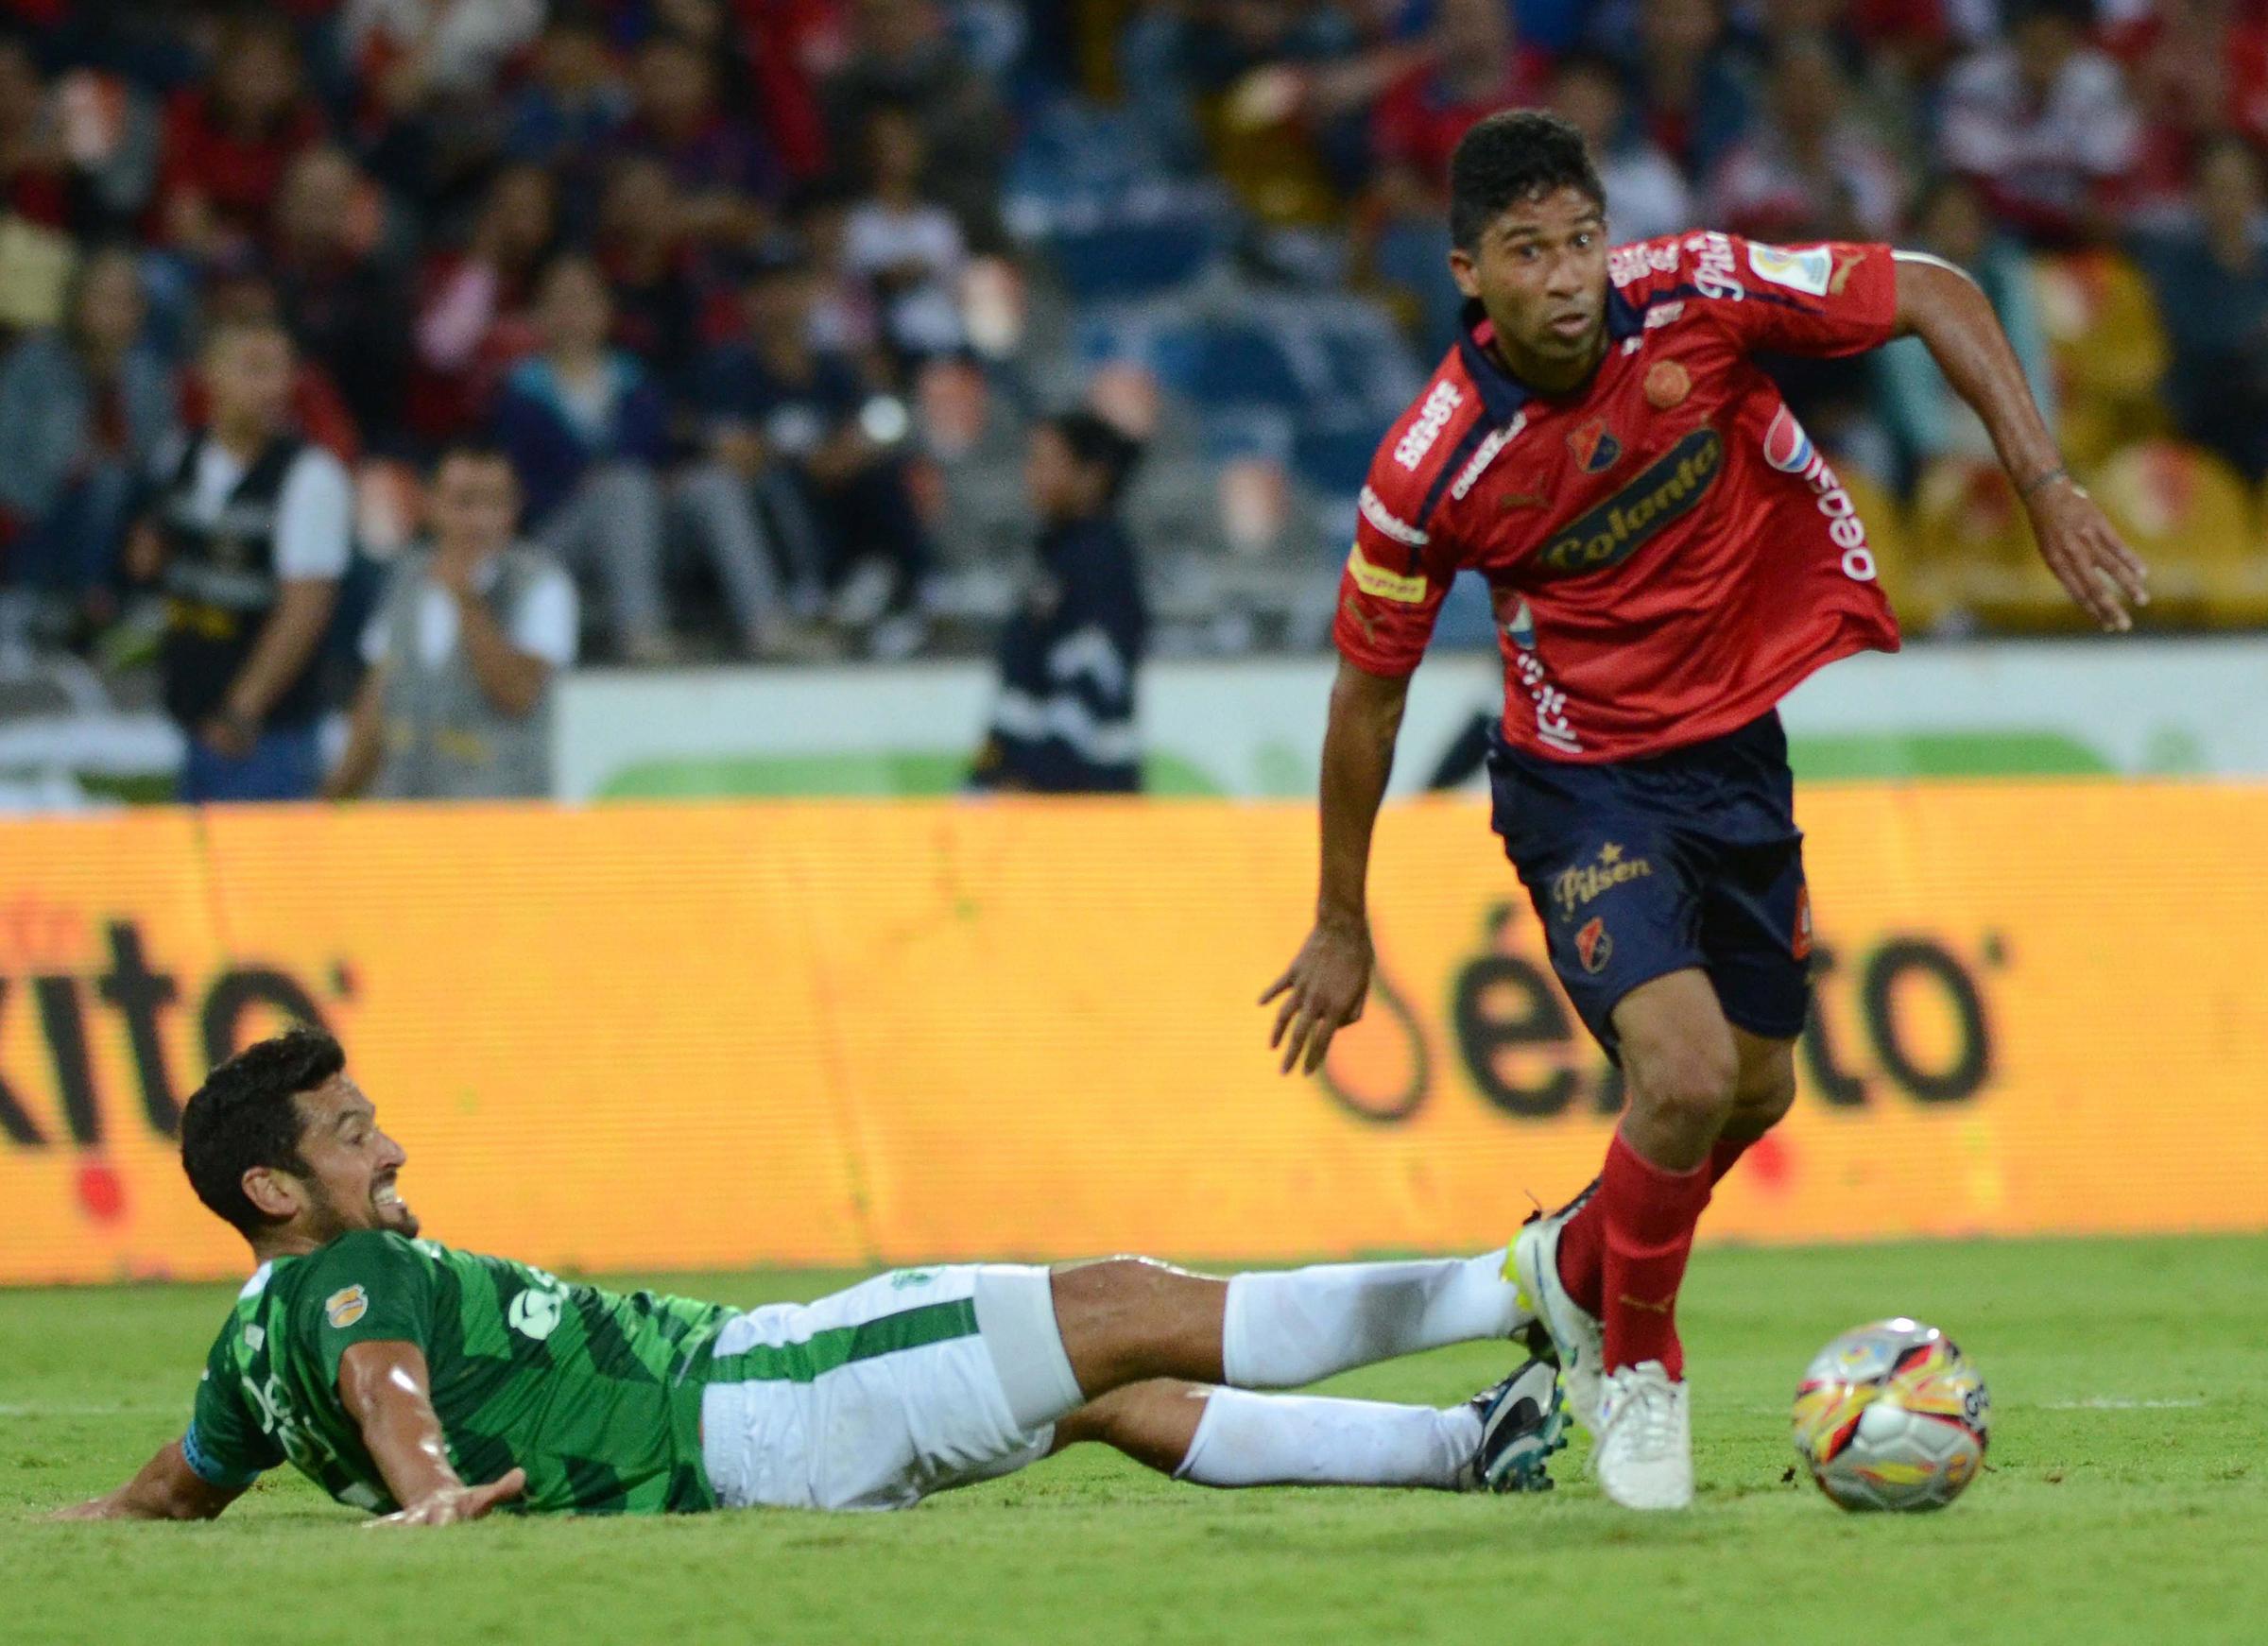 Andrés Pérez Deportivo Cali vs Medellín GALERÍA